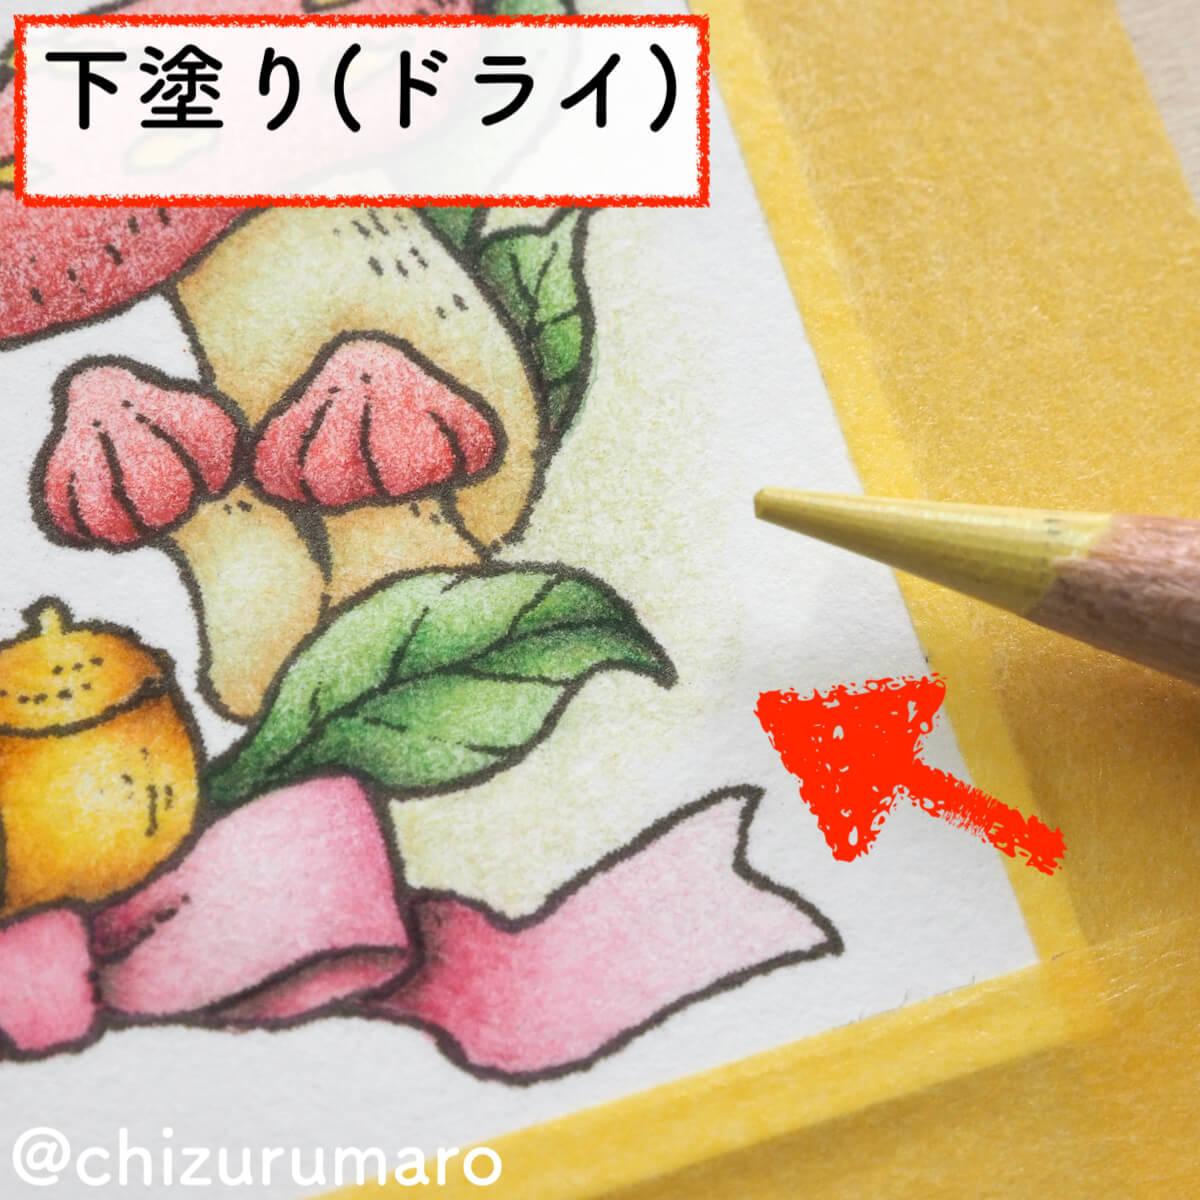 f:id:chizurumaro:20200218160754j:plain